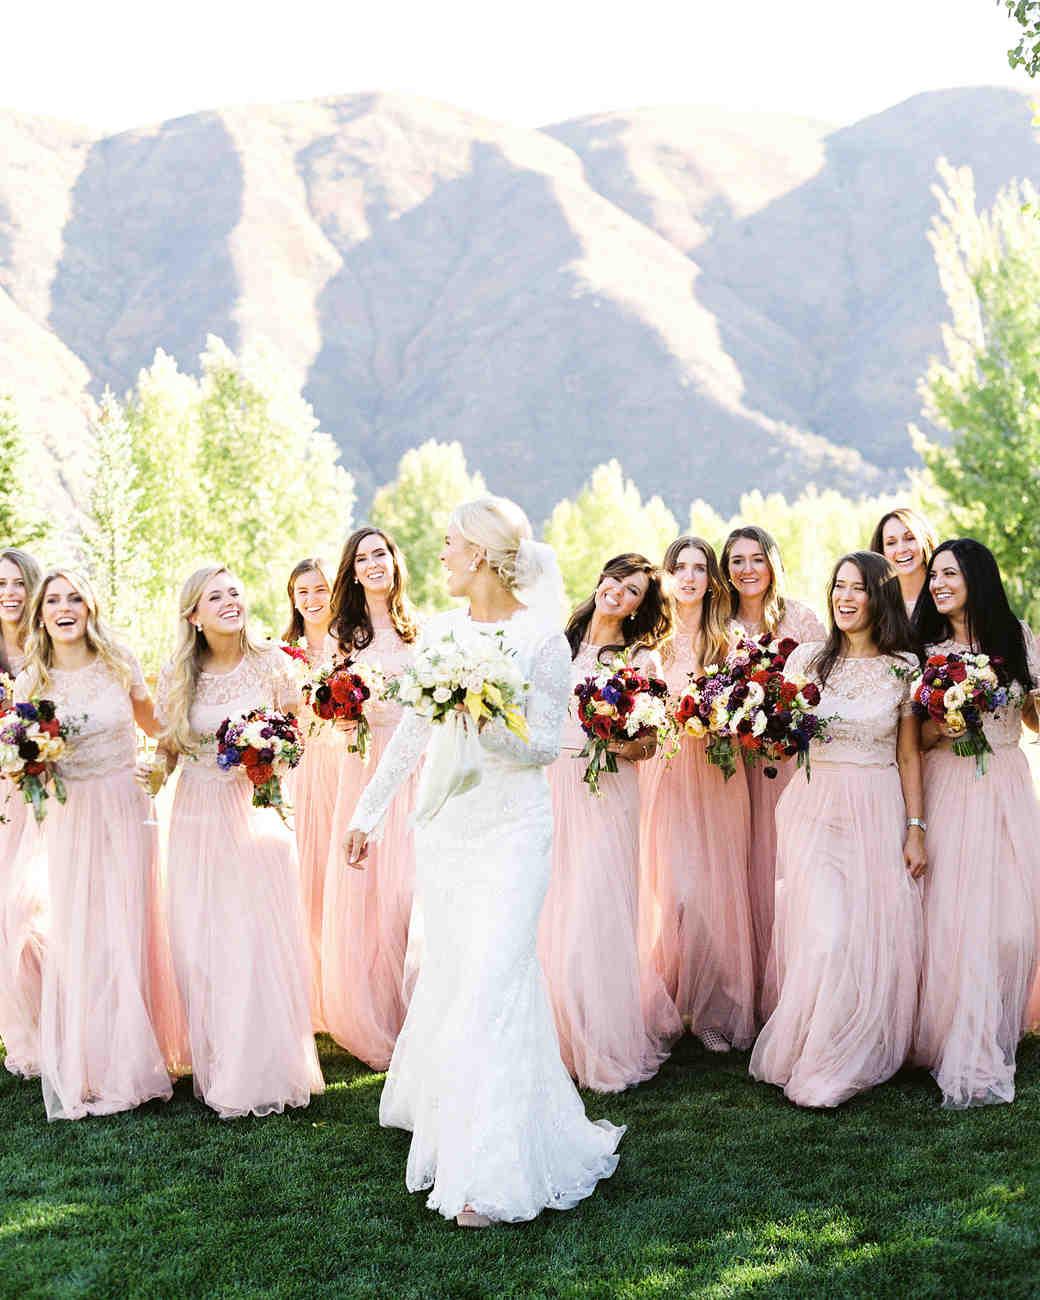 Bridesmaids Martha Stewart Weddings